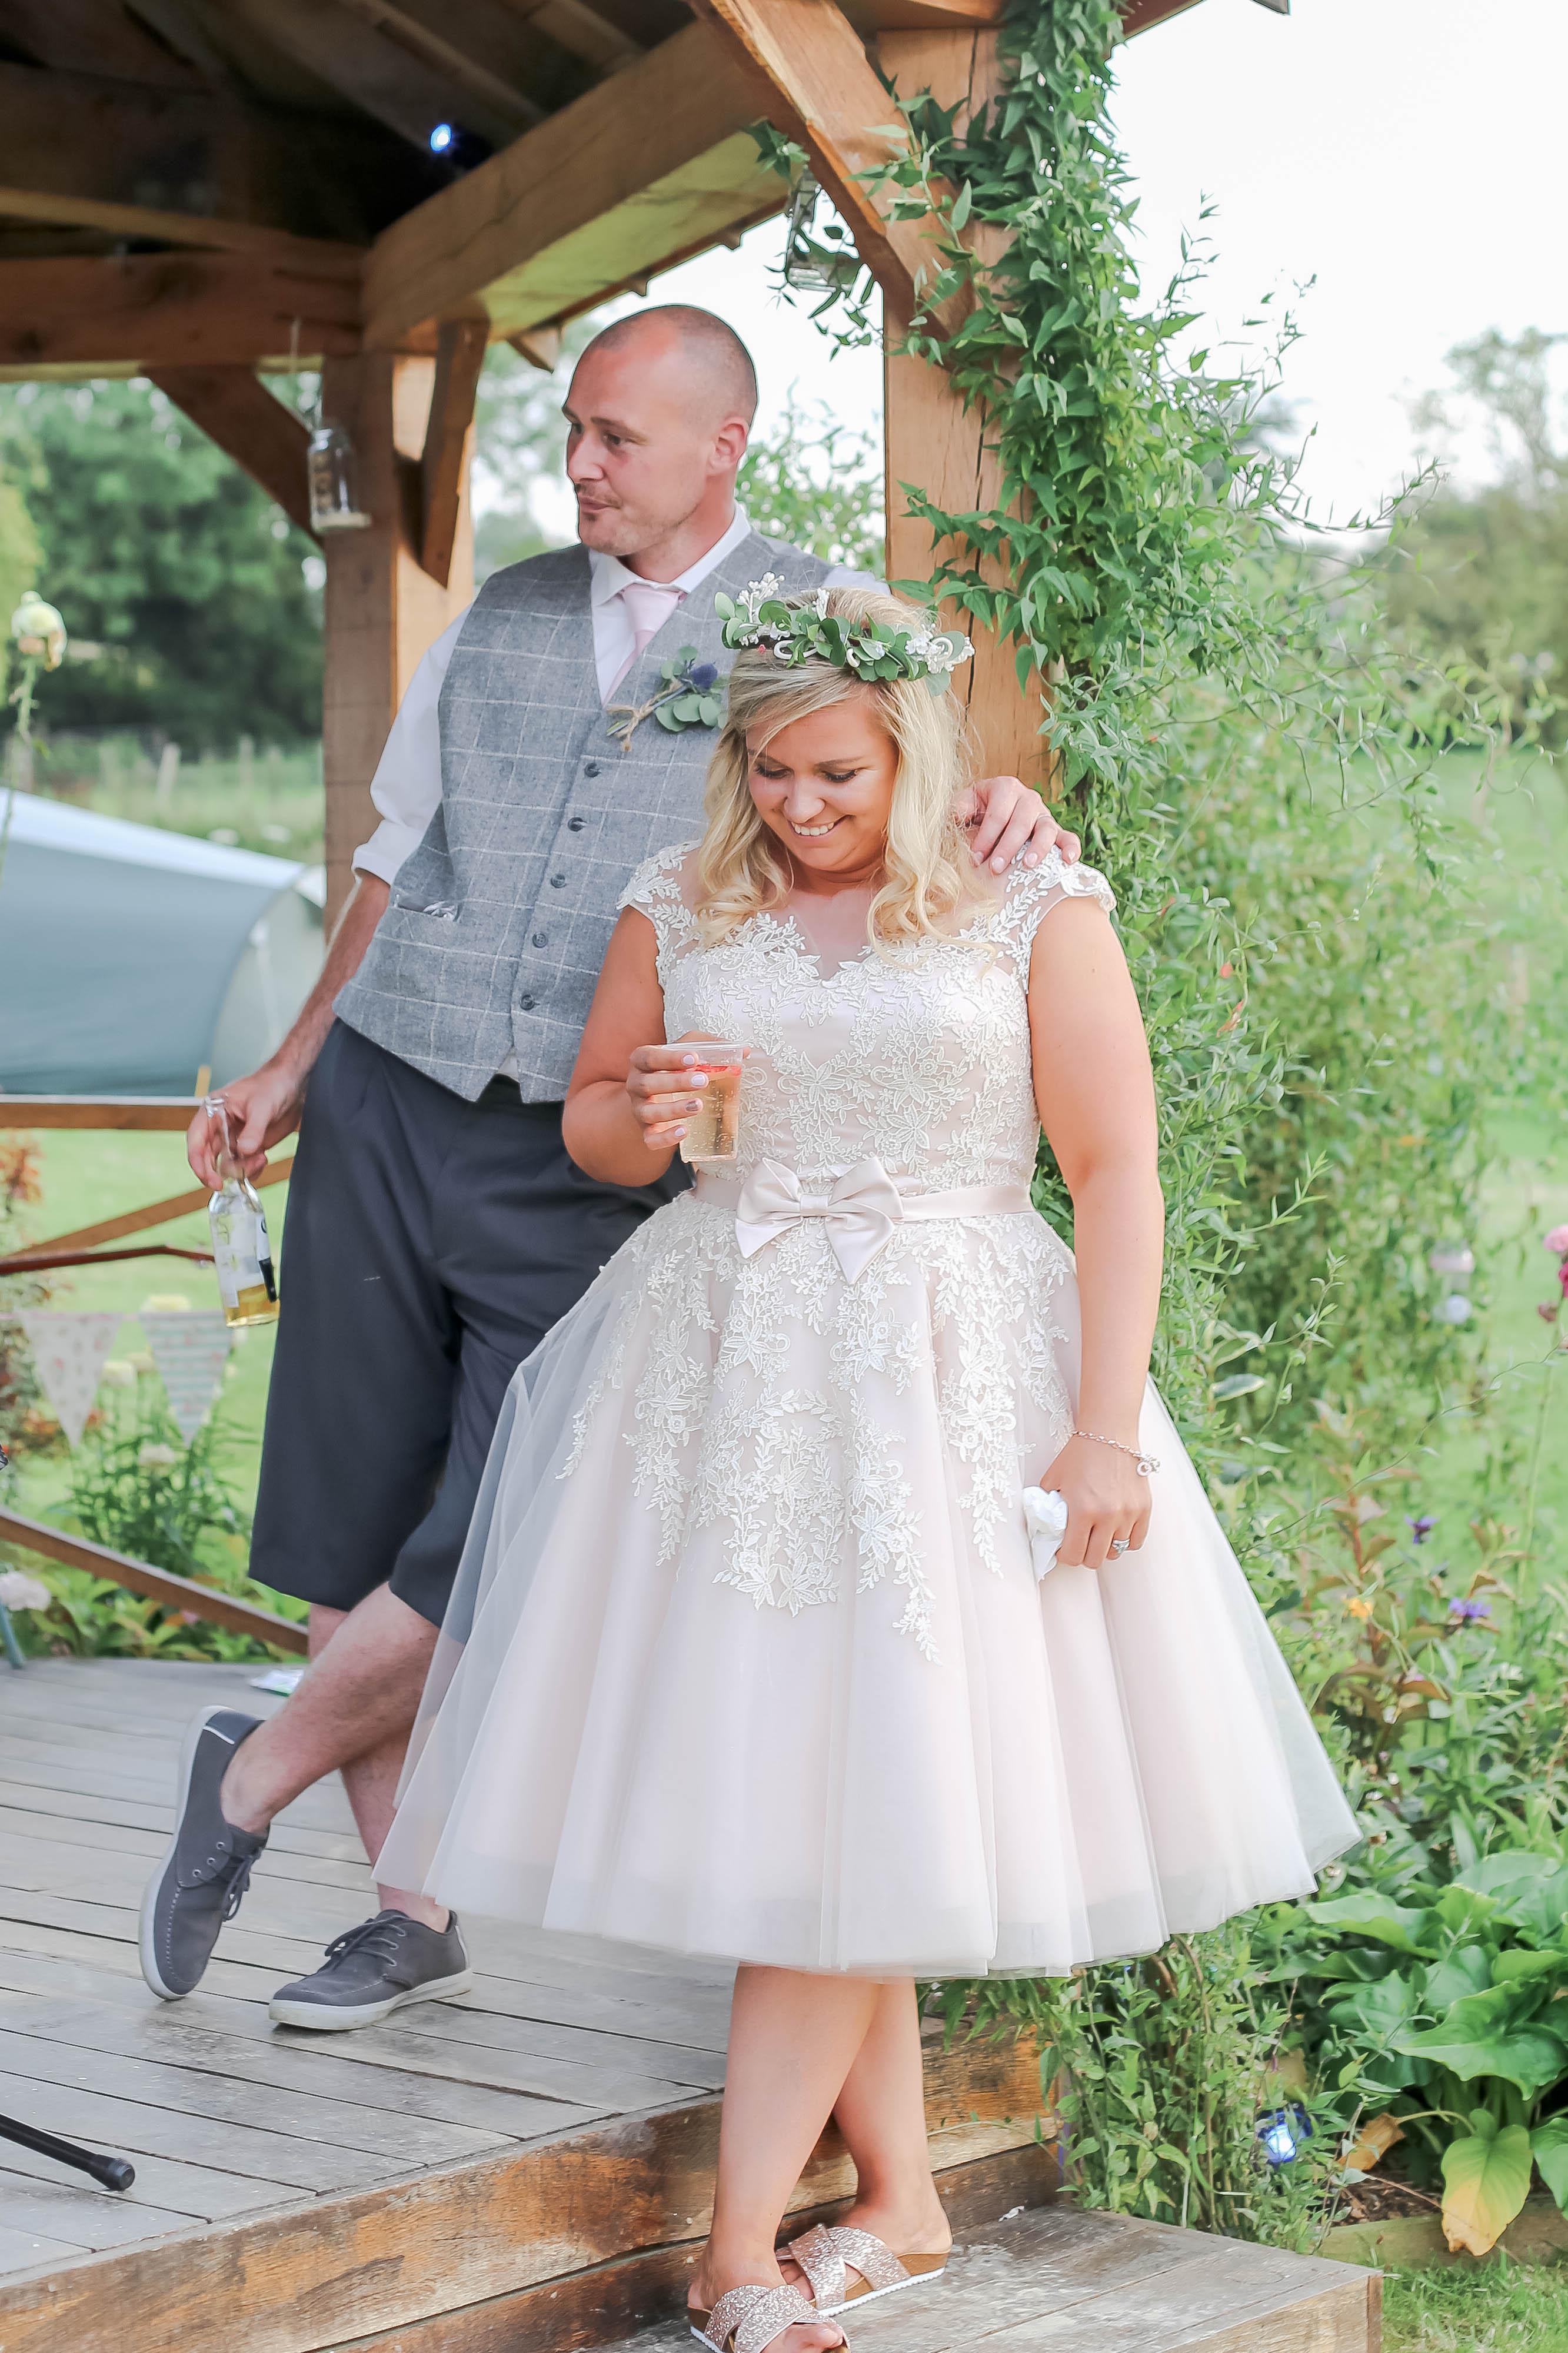 Weddings at Hampsley Hollow